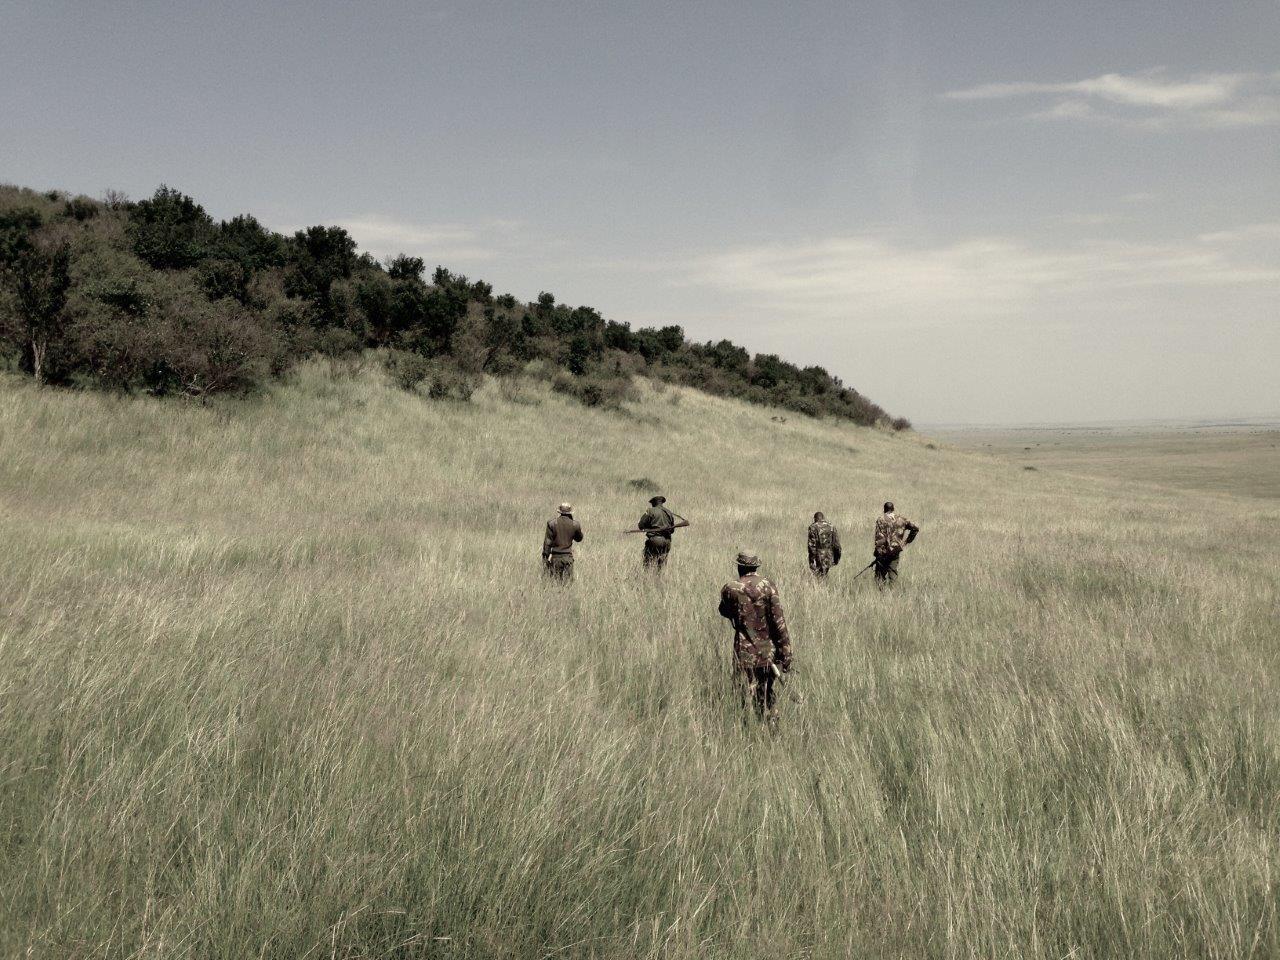 Rangers in Grass_FullSizeRender low res